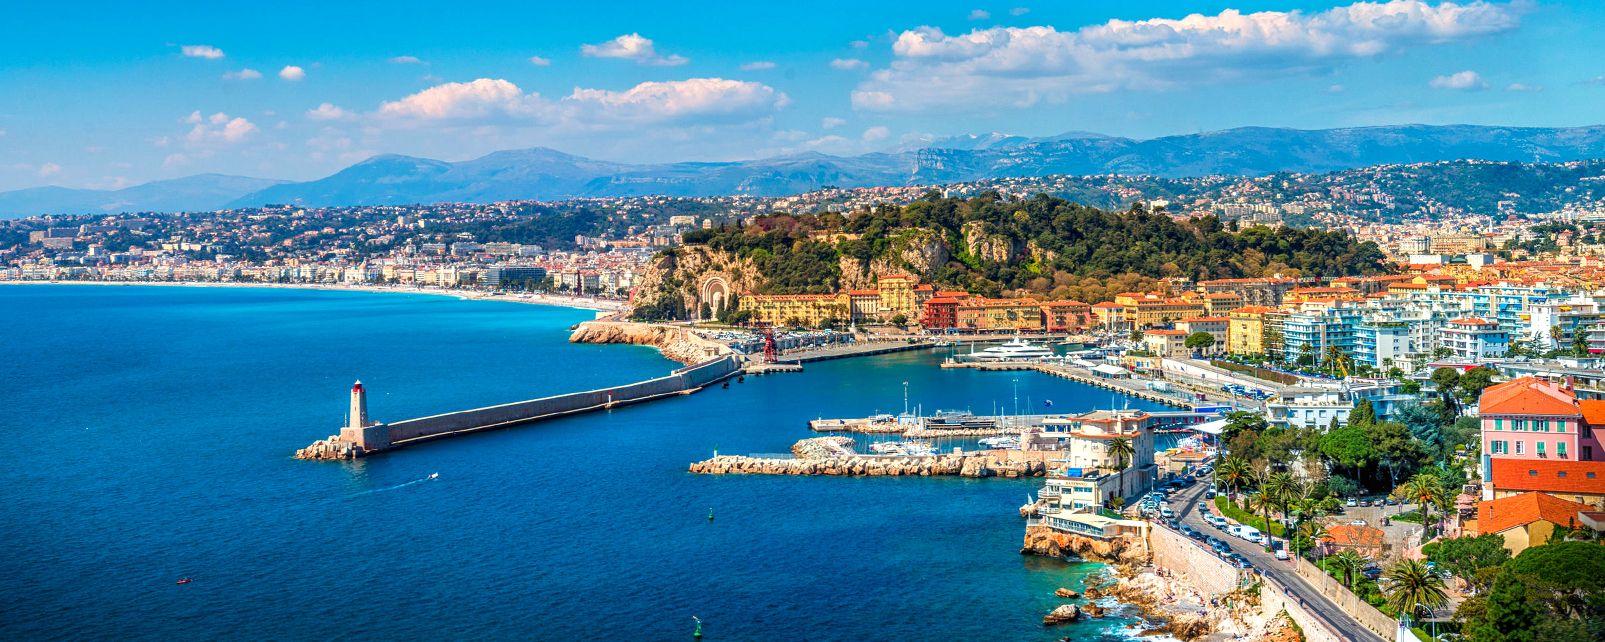 Francia, Panorama di Nizza